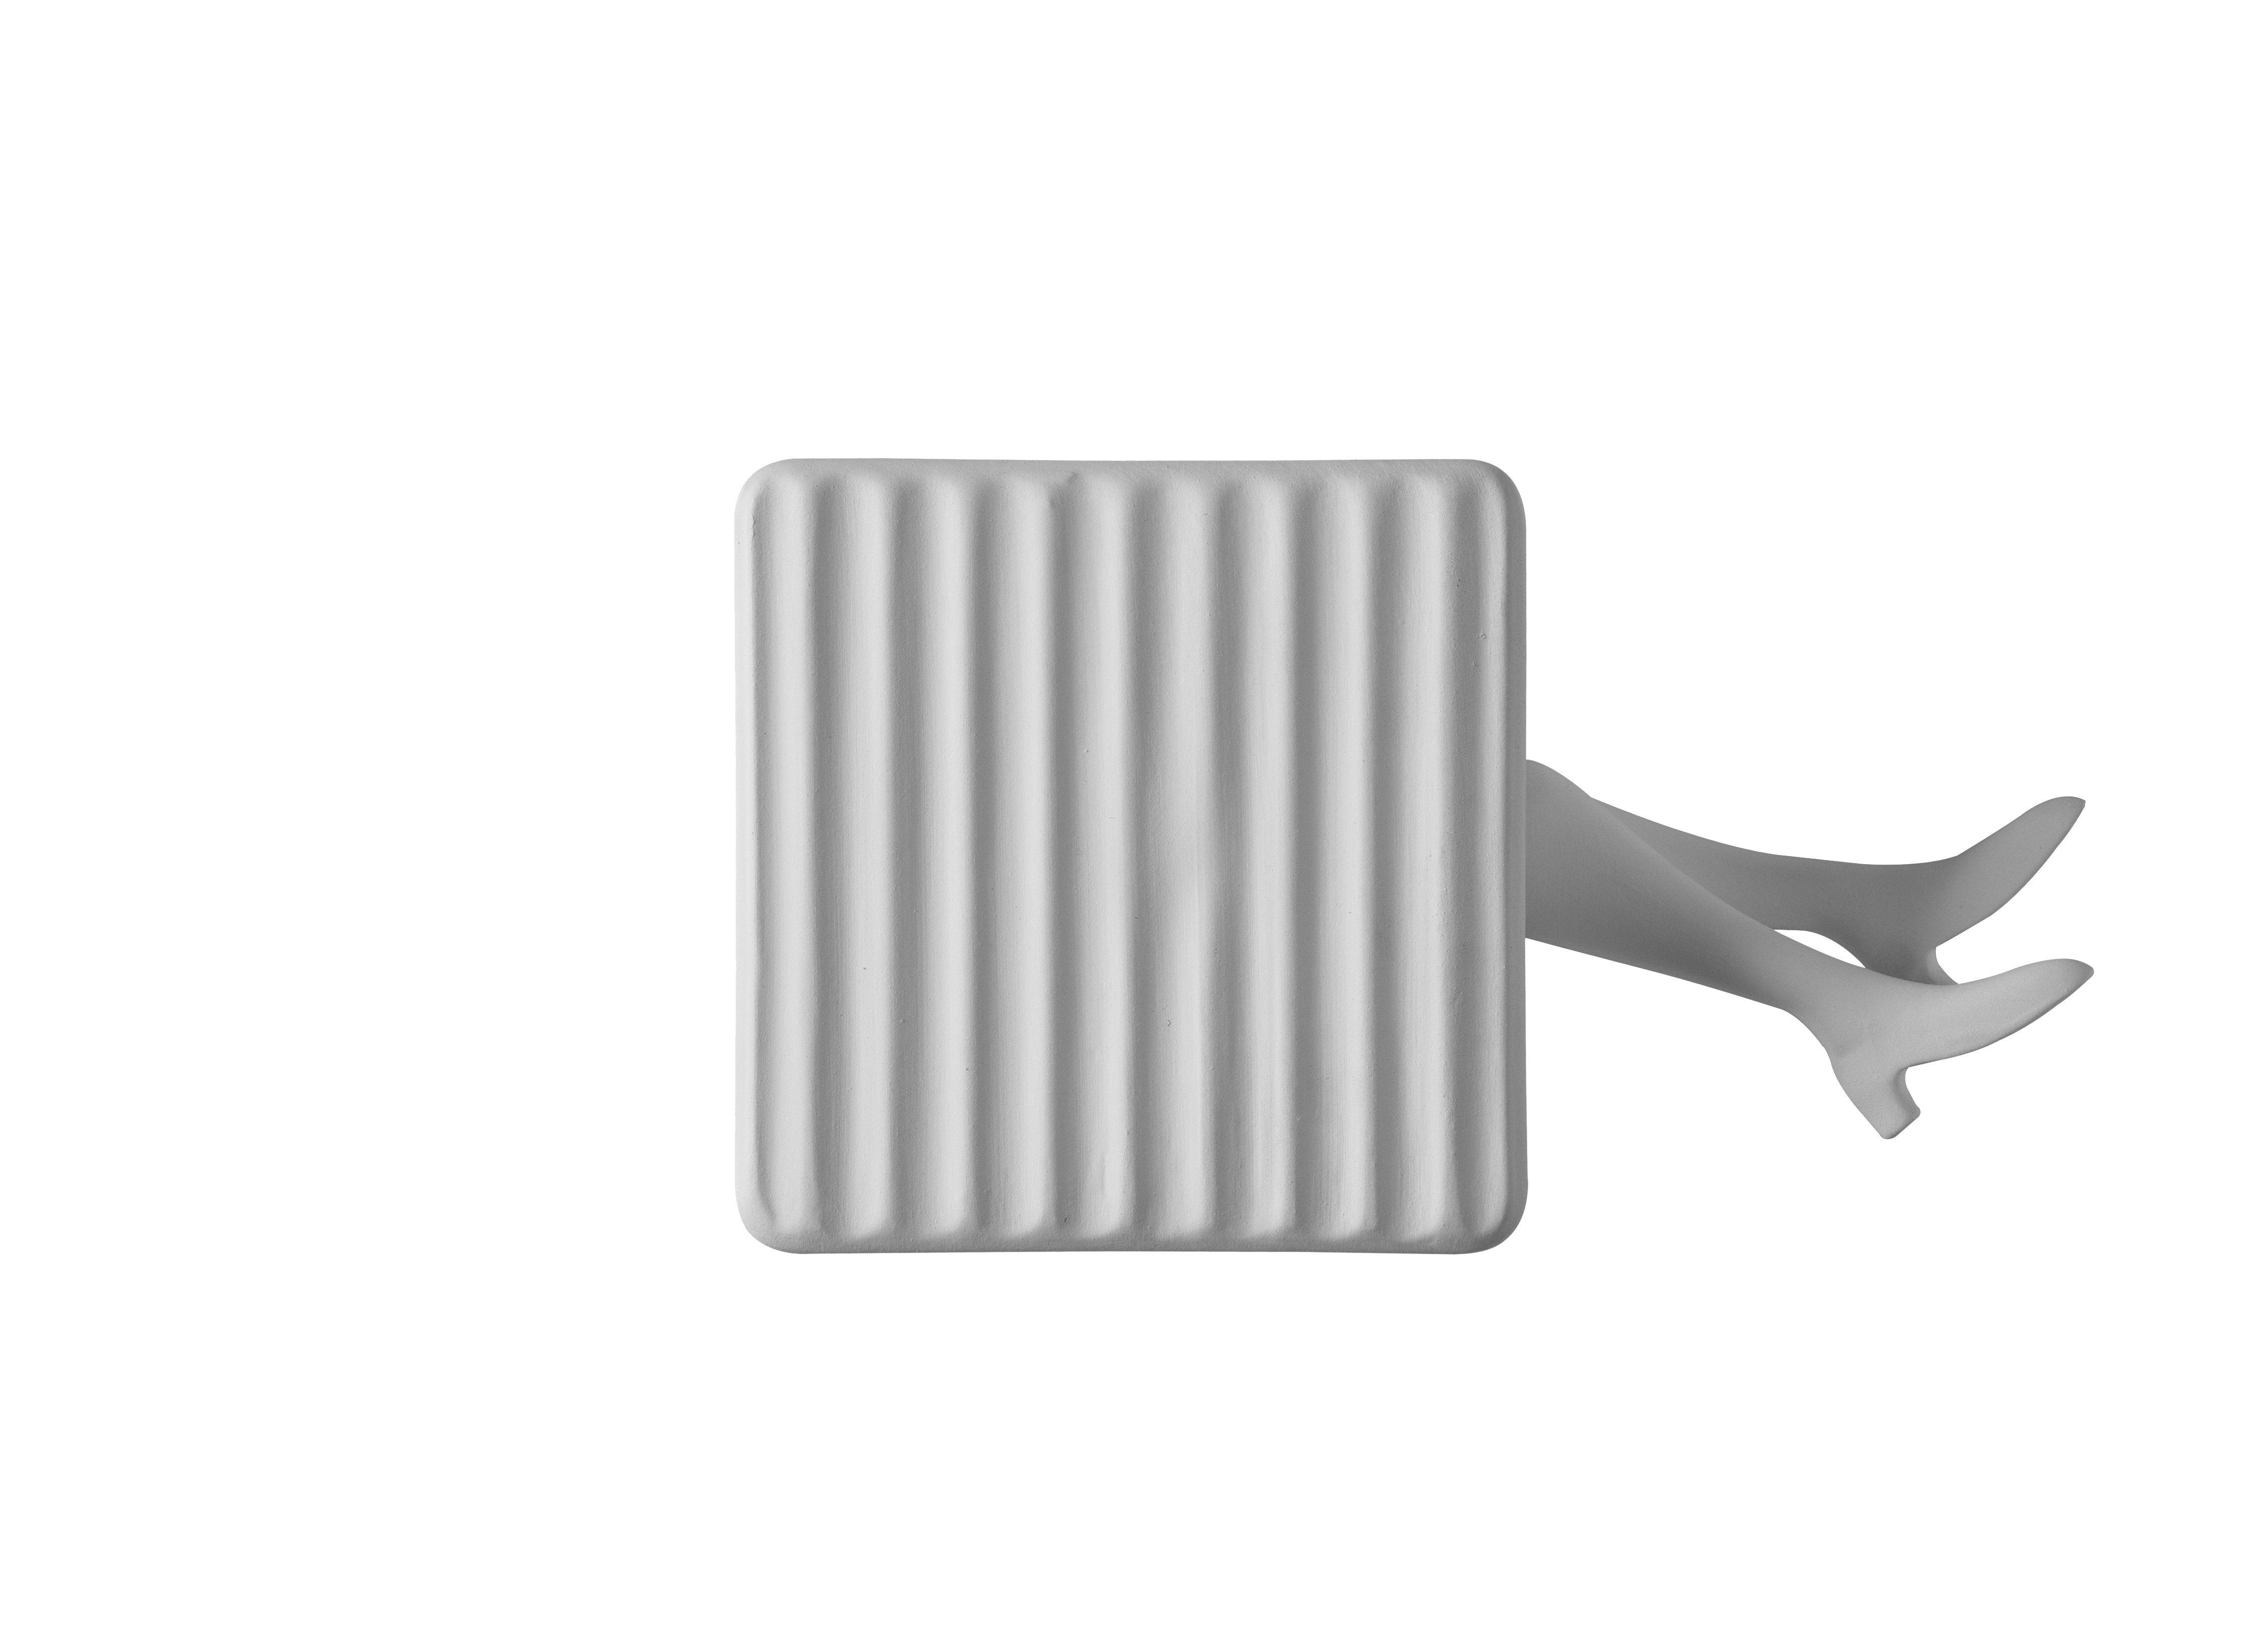 Illuminazione - Lampade da parete - Applique Binarell LED - / Gambe - Ceramica di Karman - Gambe / Bianco - Ceramica